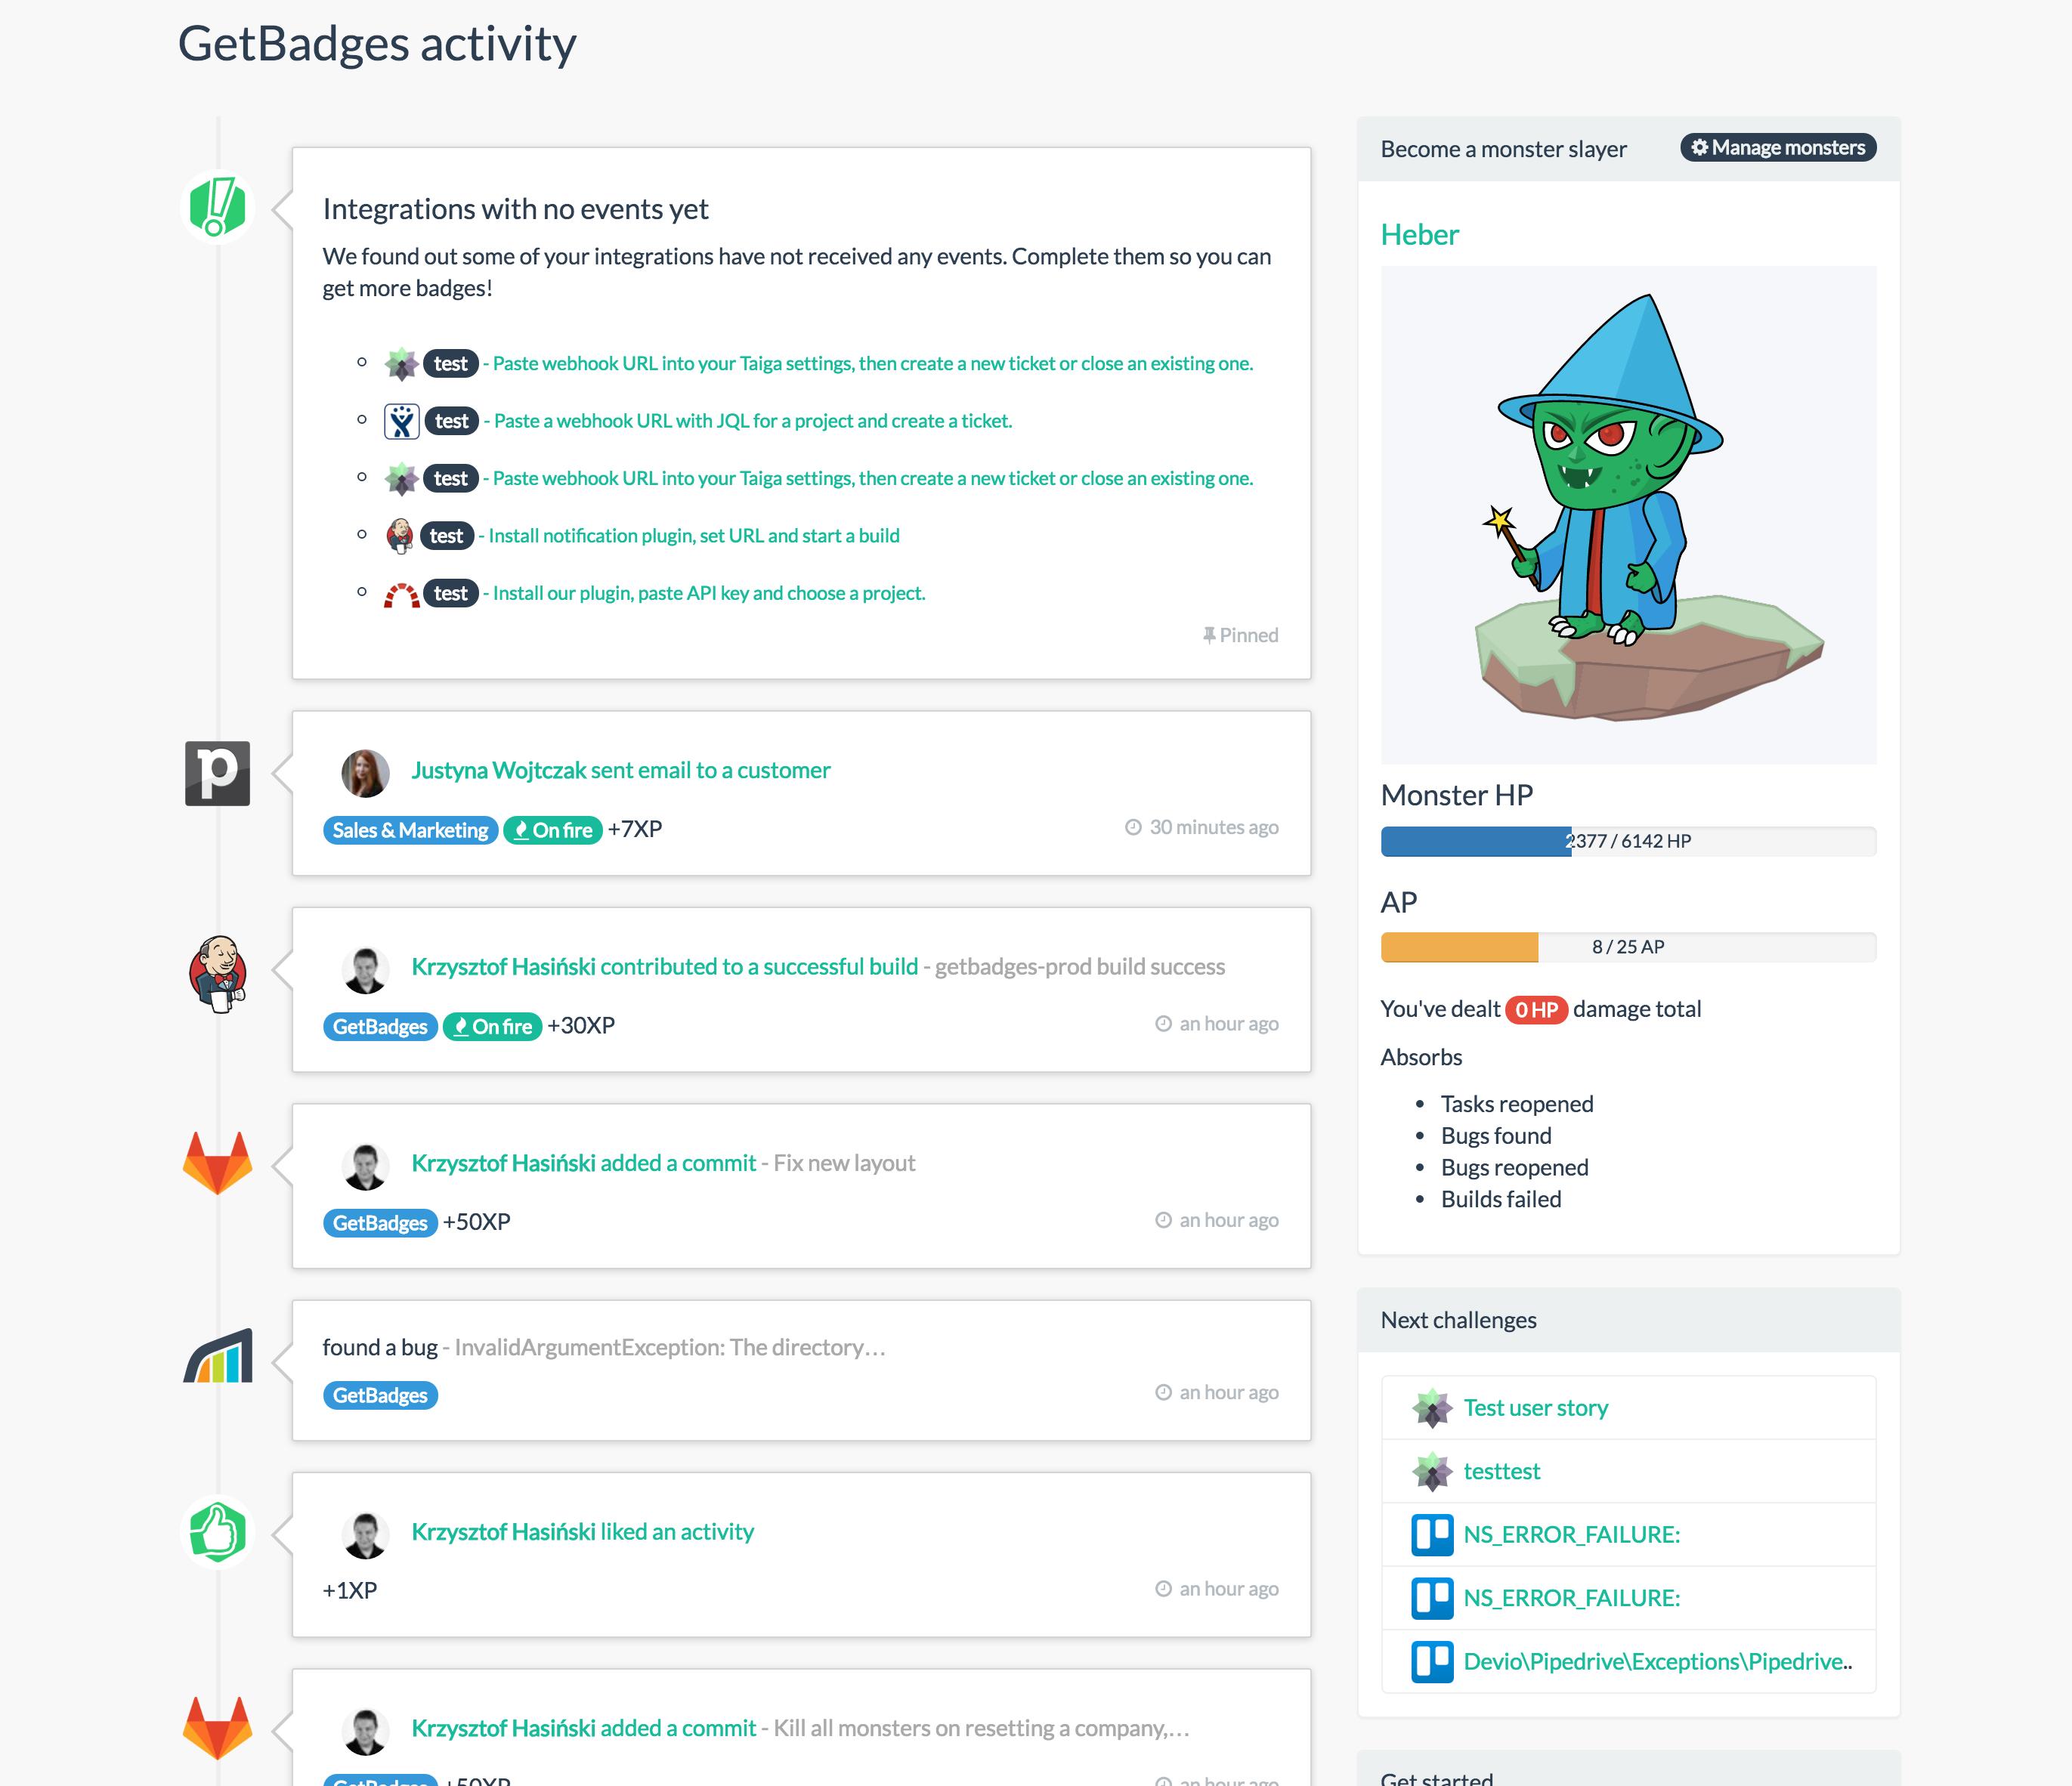 GetBadges Demo - Main activity screen